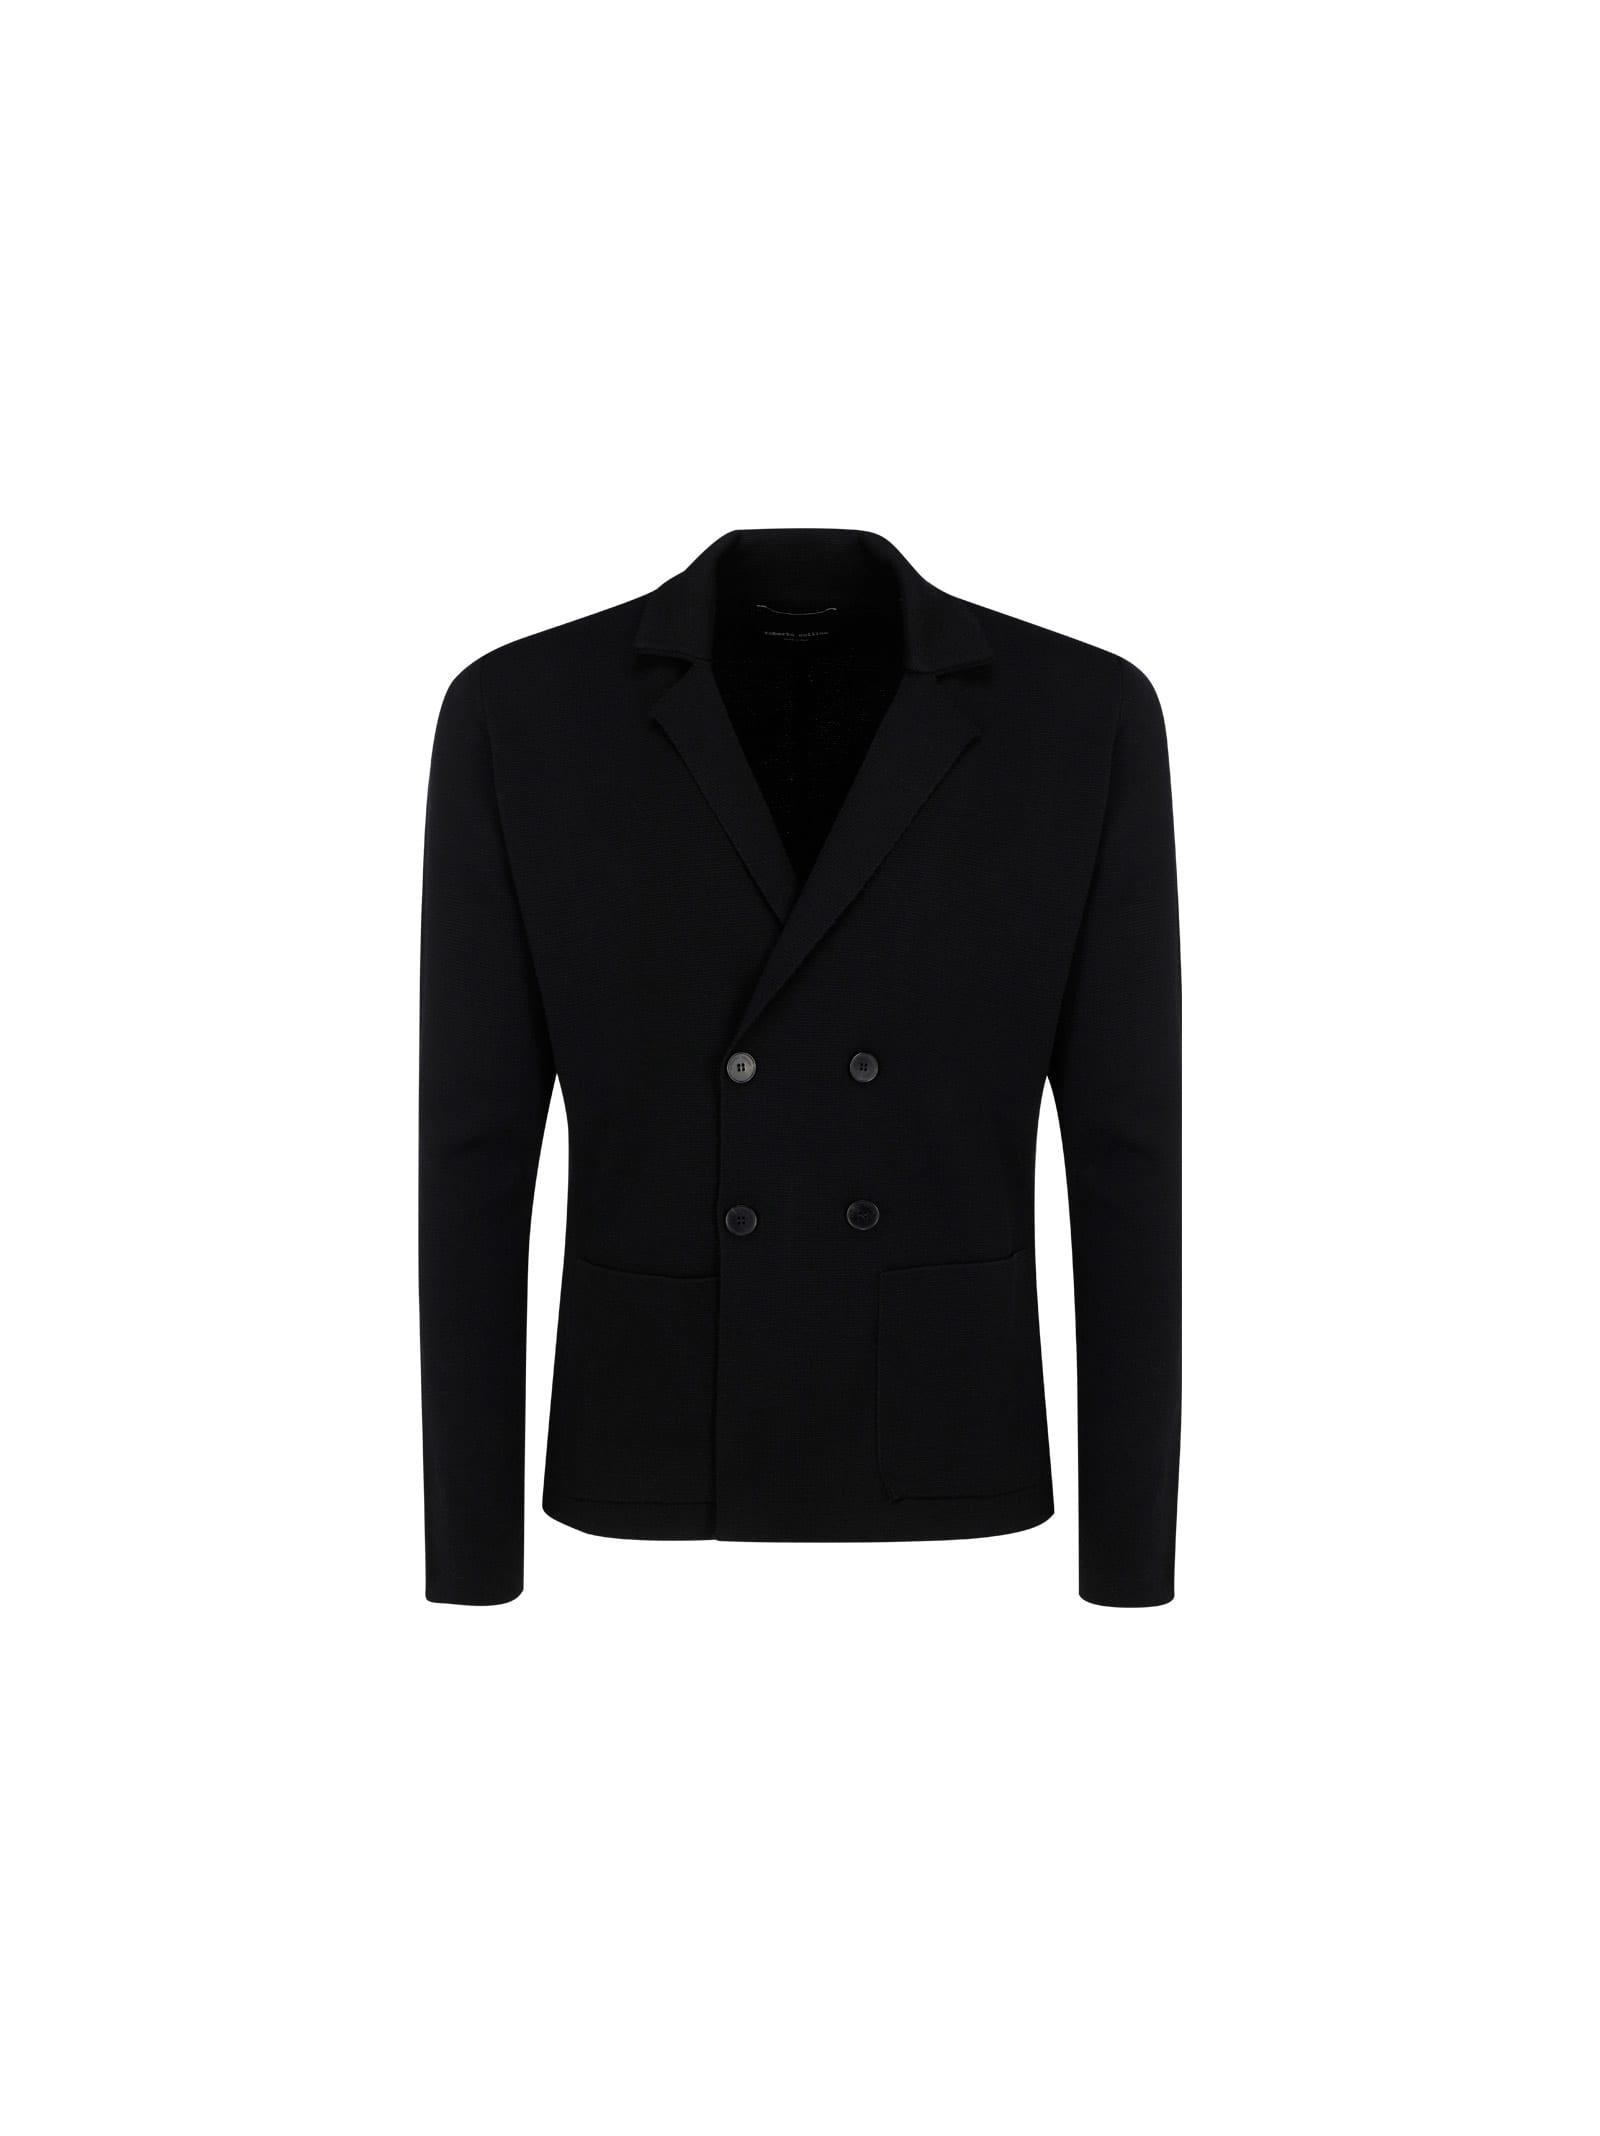 Roberto Collina Jacket